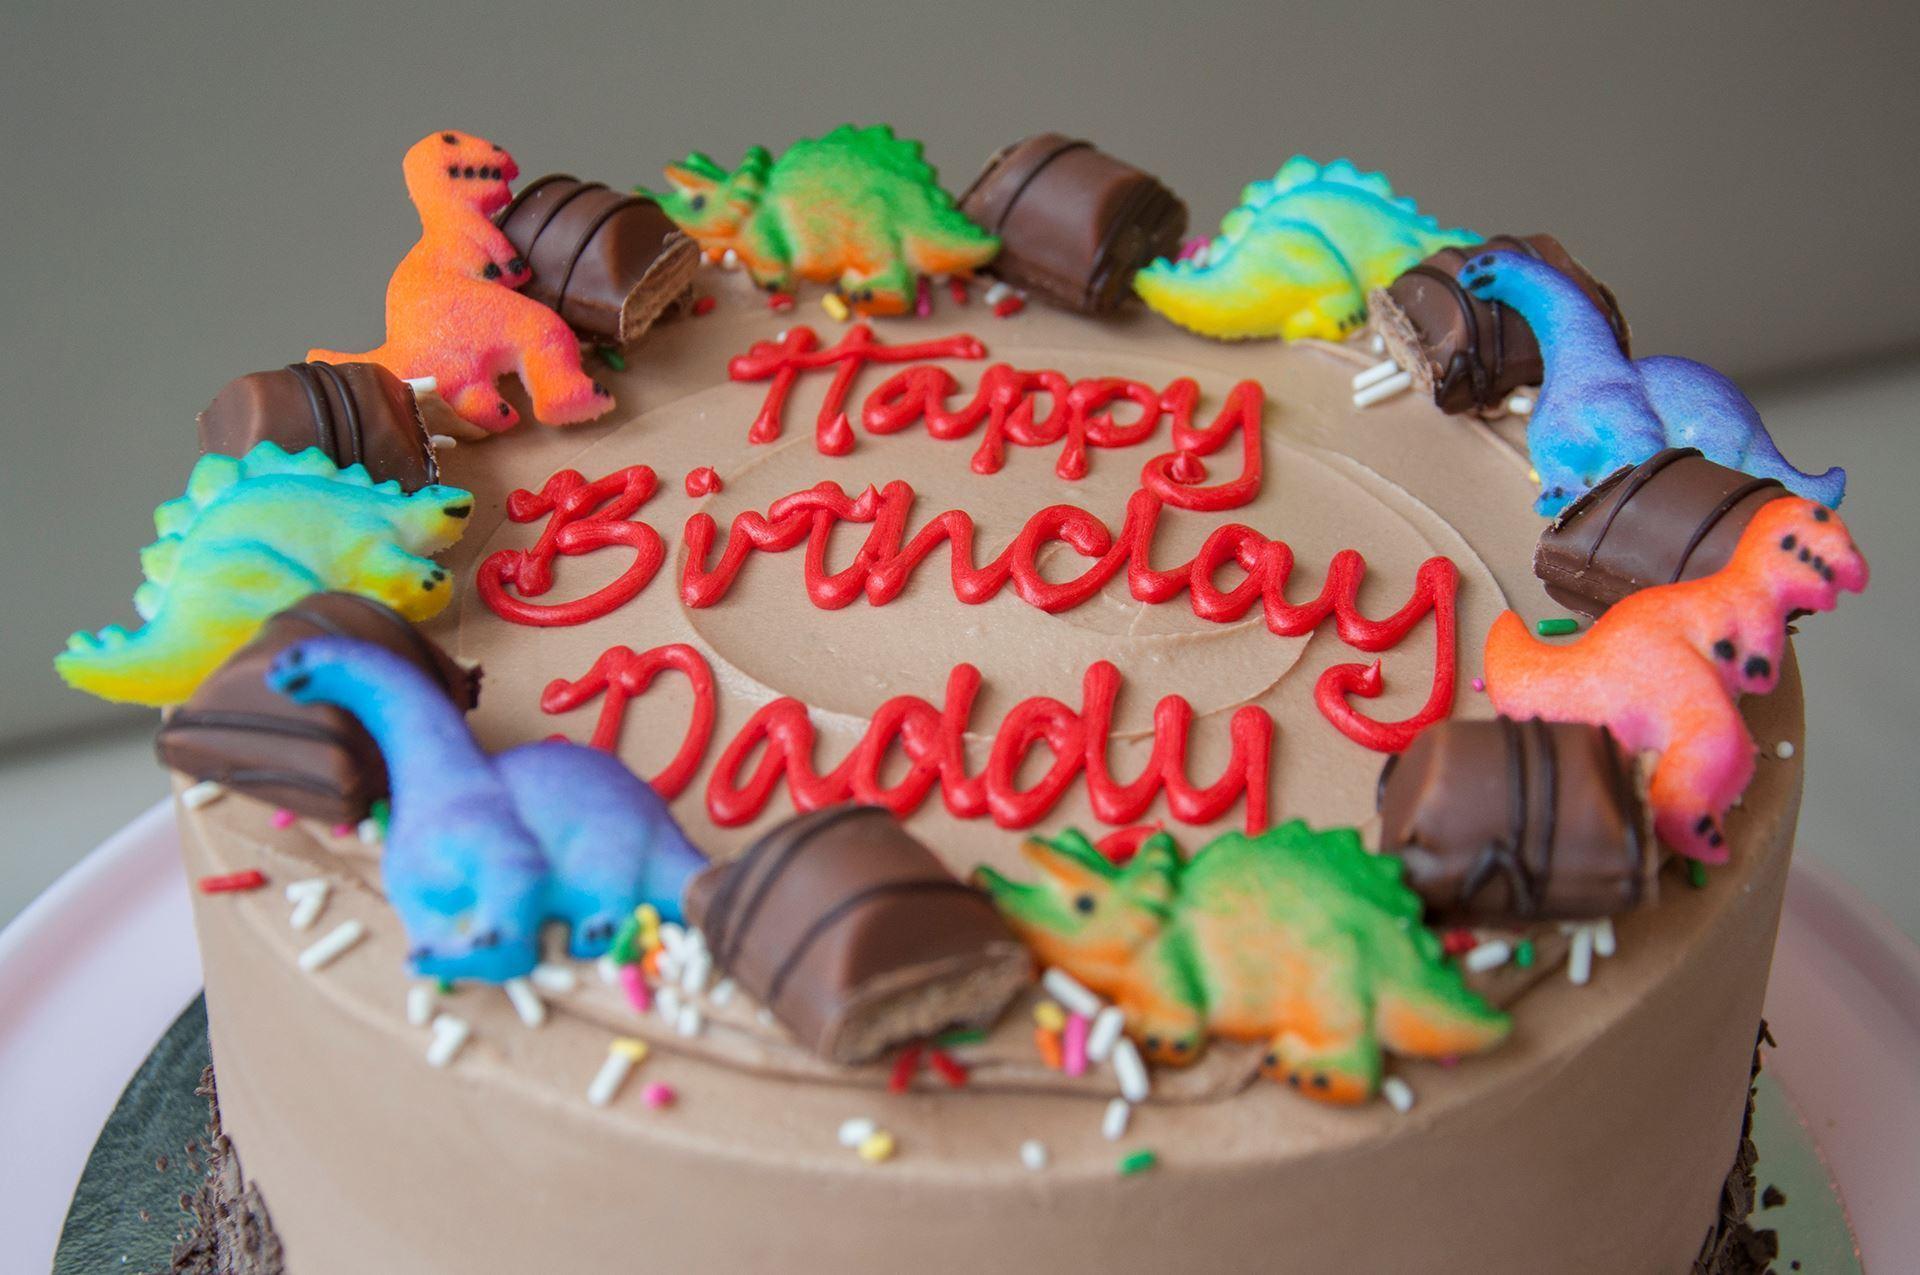 Primrose Bakery Kinder Bueno Layer Cake Review